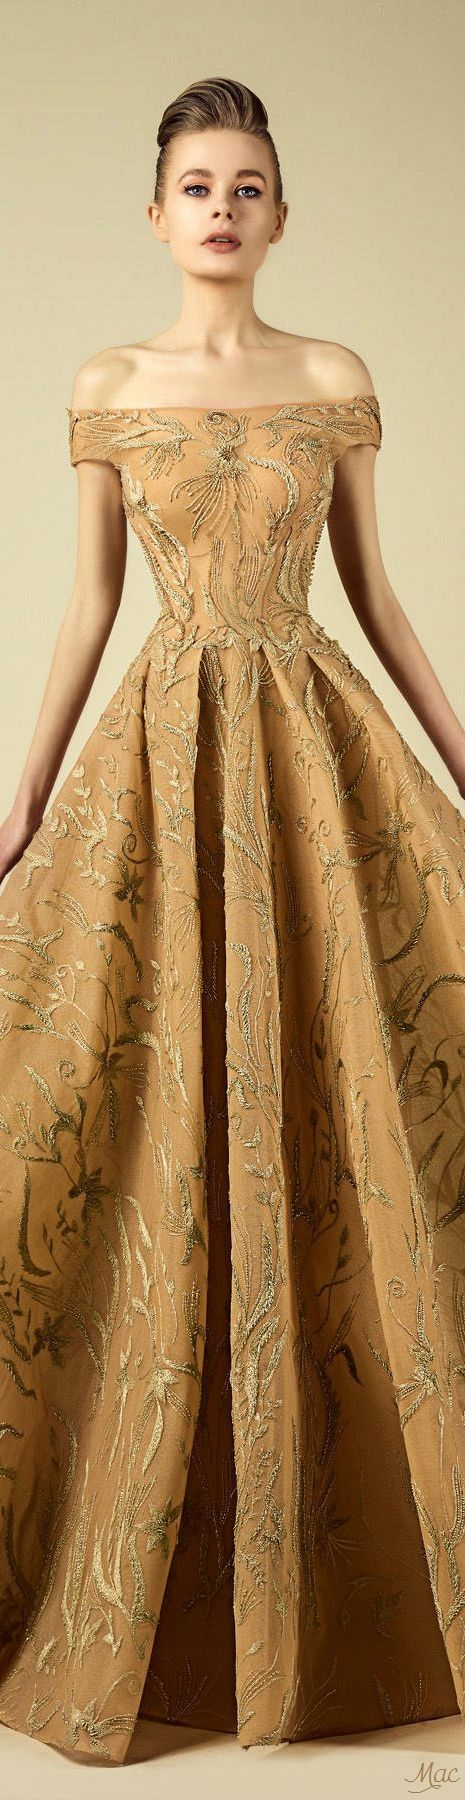 Spring 2017 Haute Couture Fadwa Baalbaki #wedding #weddingdress